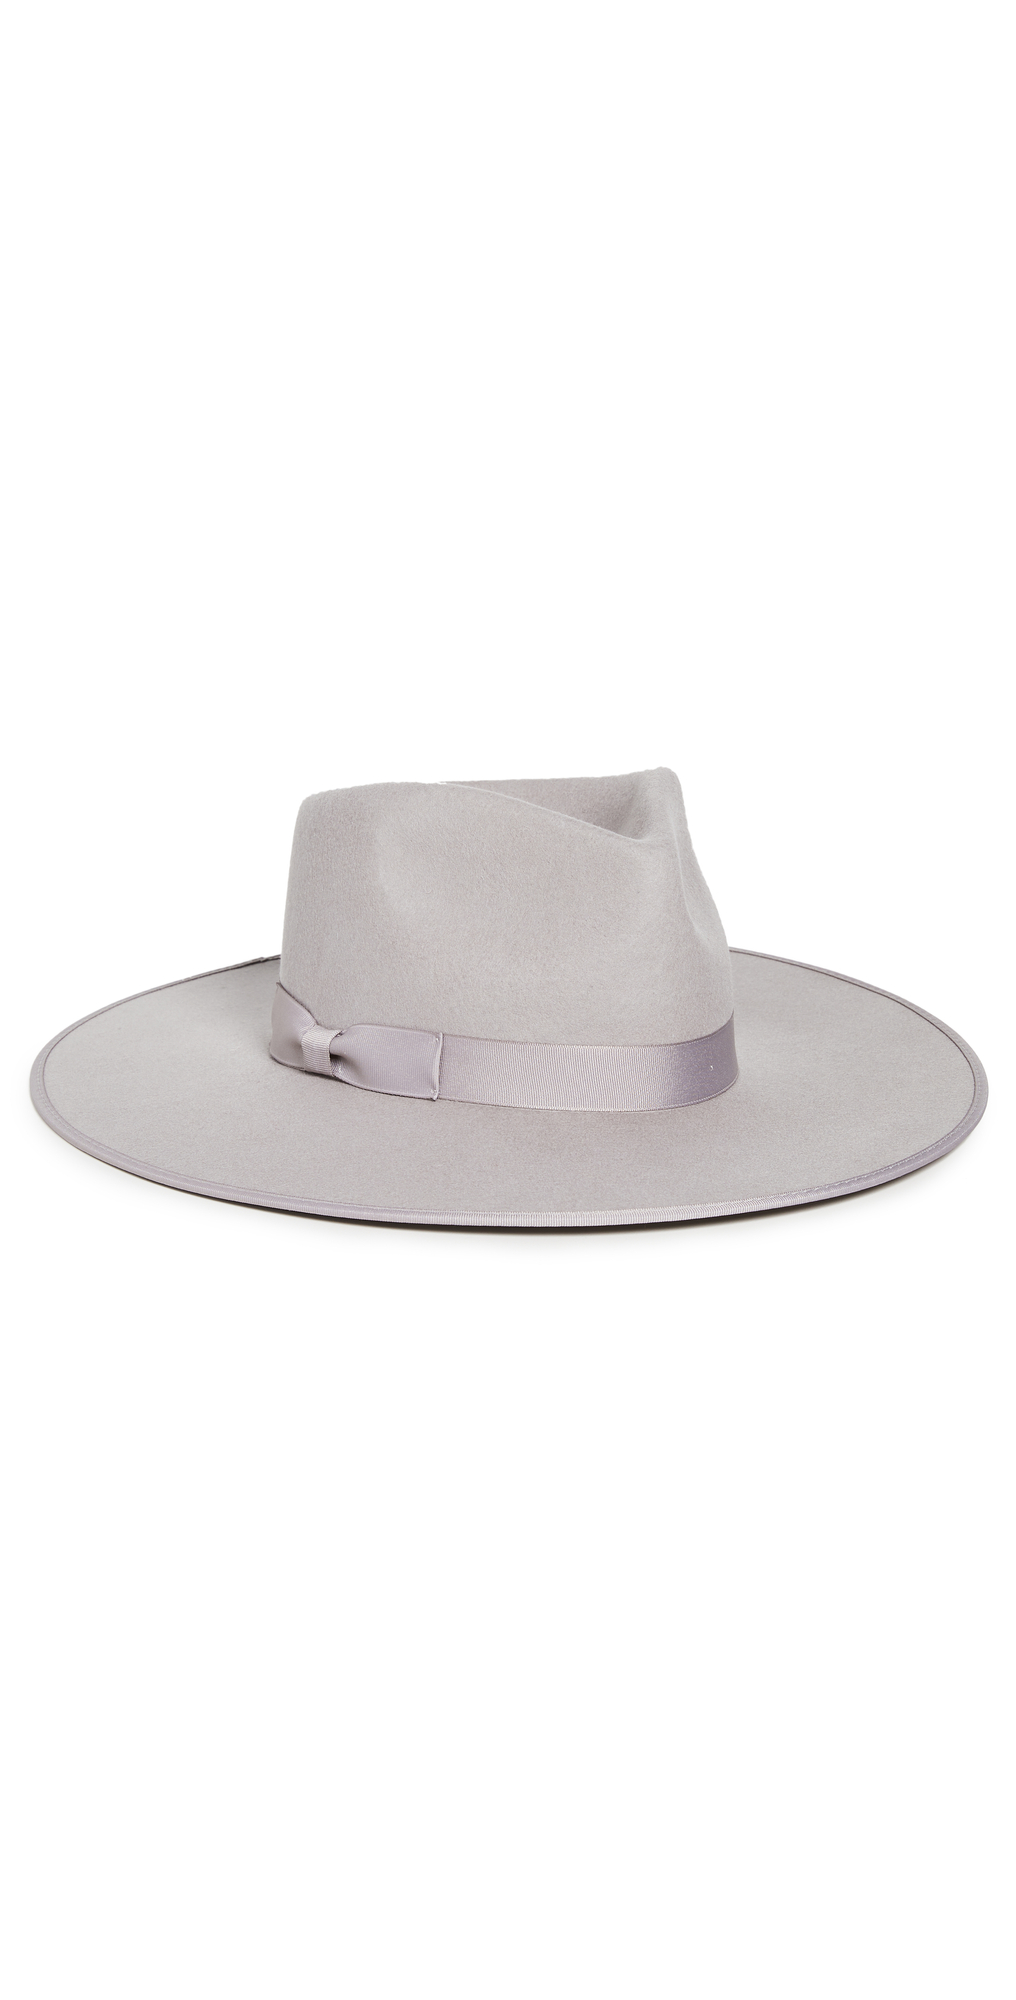 Stone Rancher Hat